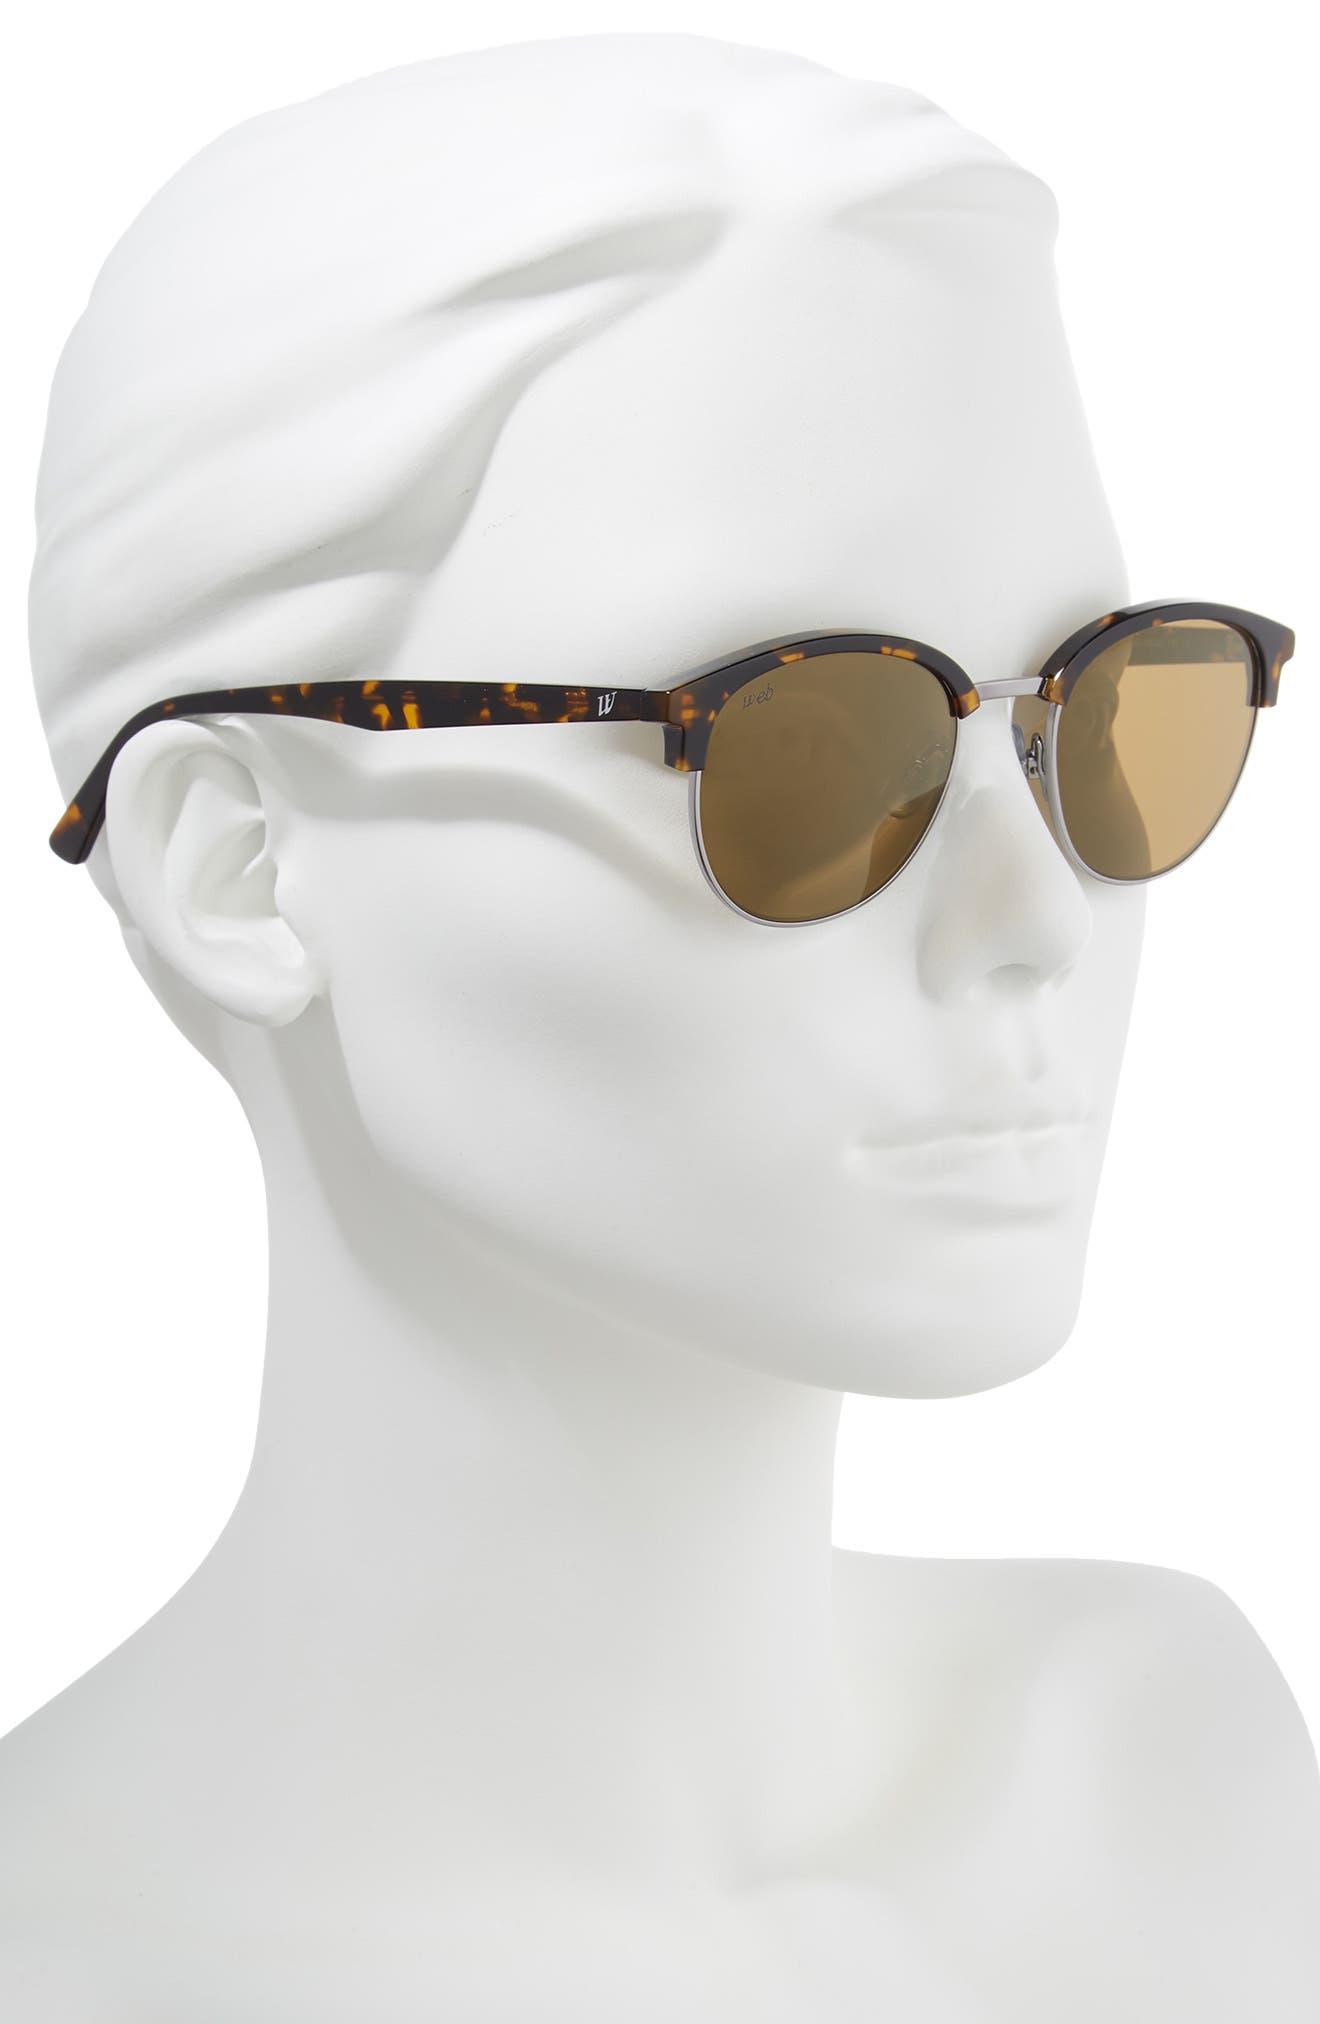 49mm Half Rim Sunglasses,                             Alternate thumbnail 2, color,                             Shiny Gunmetal/ Brown Mirror